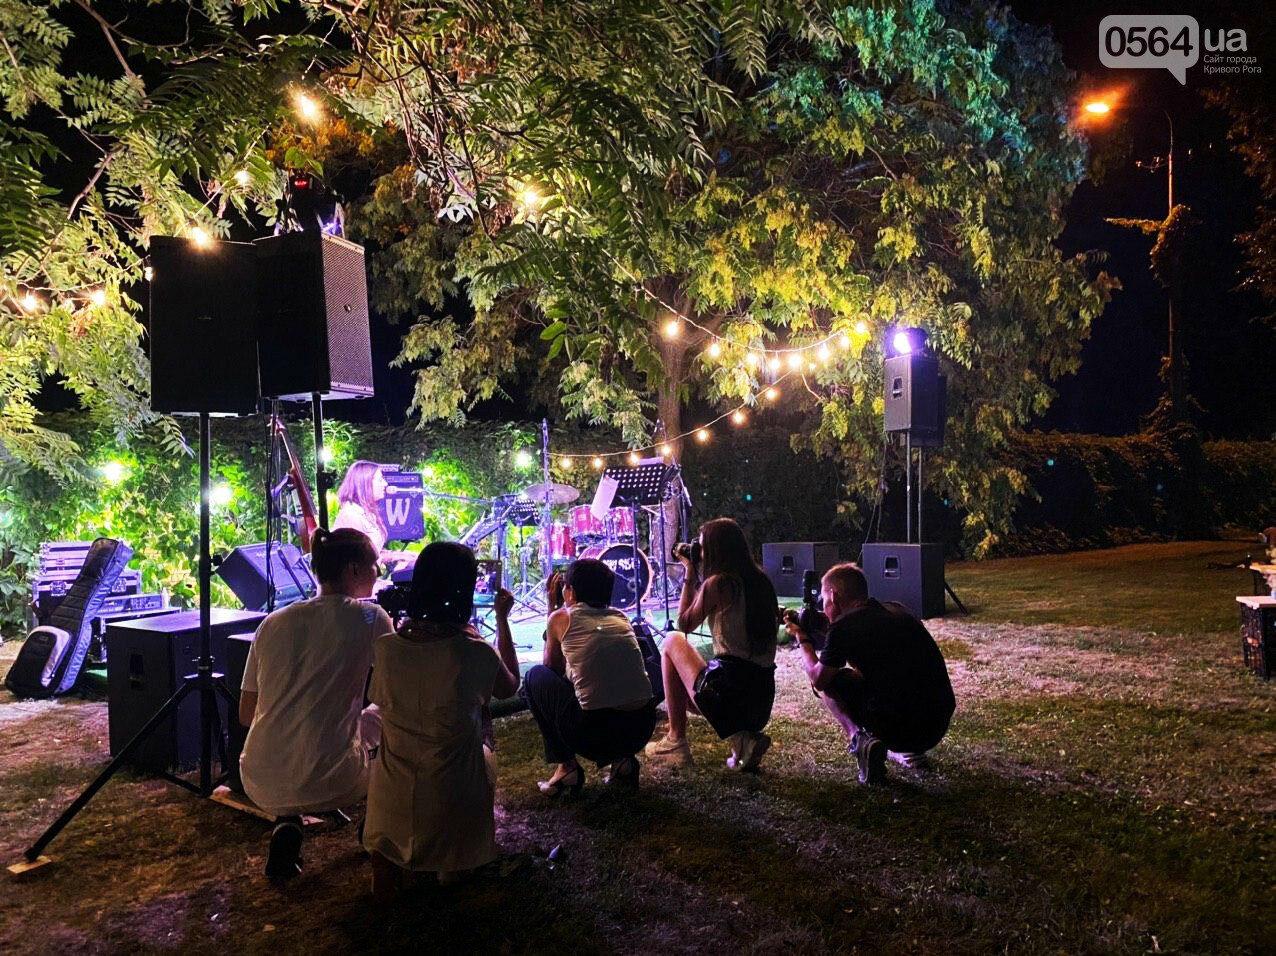 Под звездным небом криворожане наслаждались летним джазом от  Advantage Project, - ФОТО, ВИДЕО , фото-66